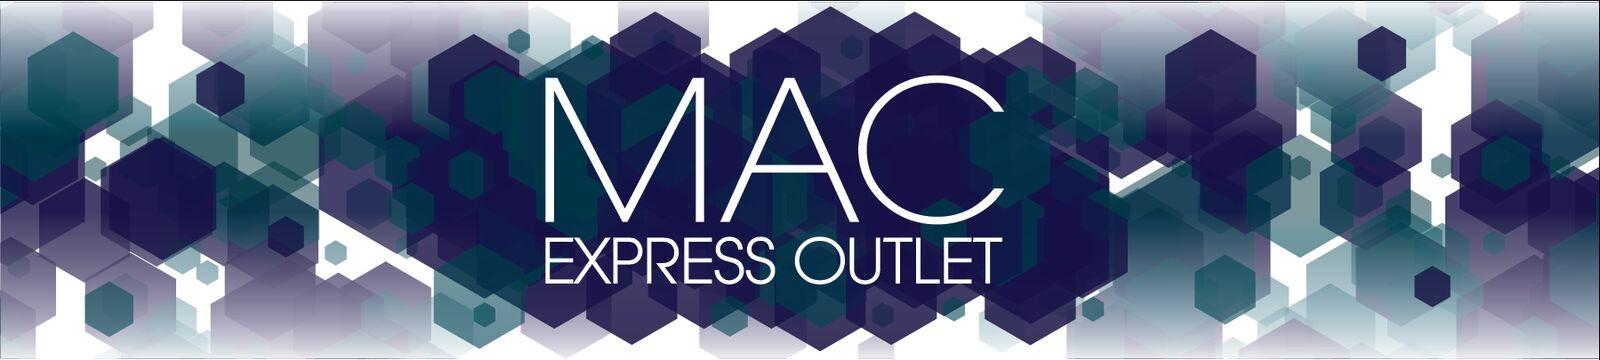 MacExpressOutlet